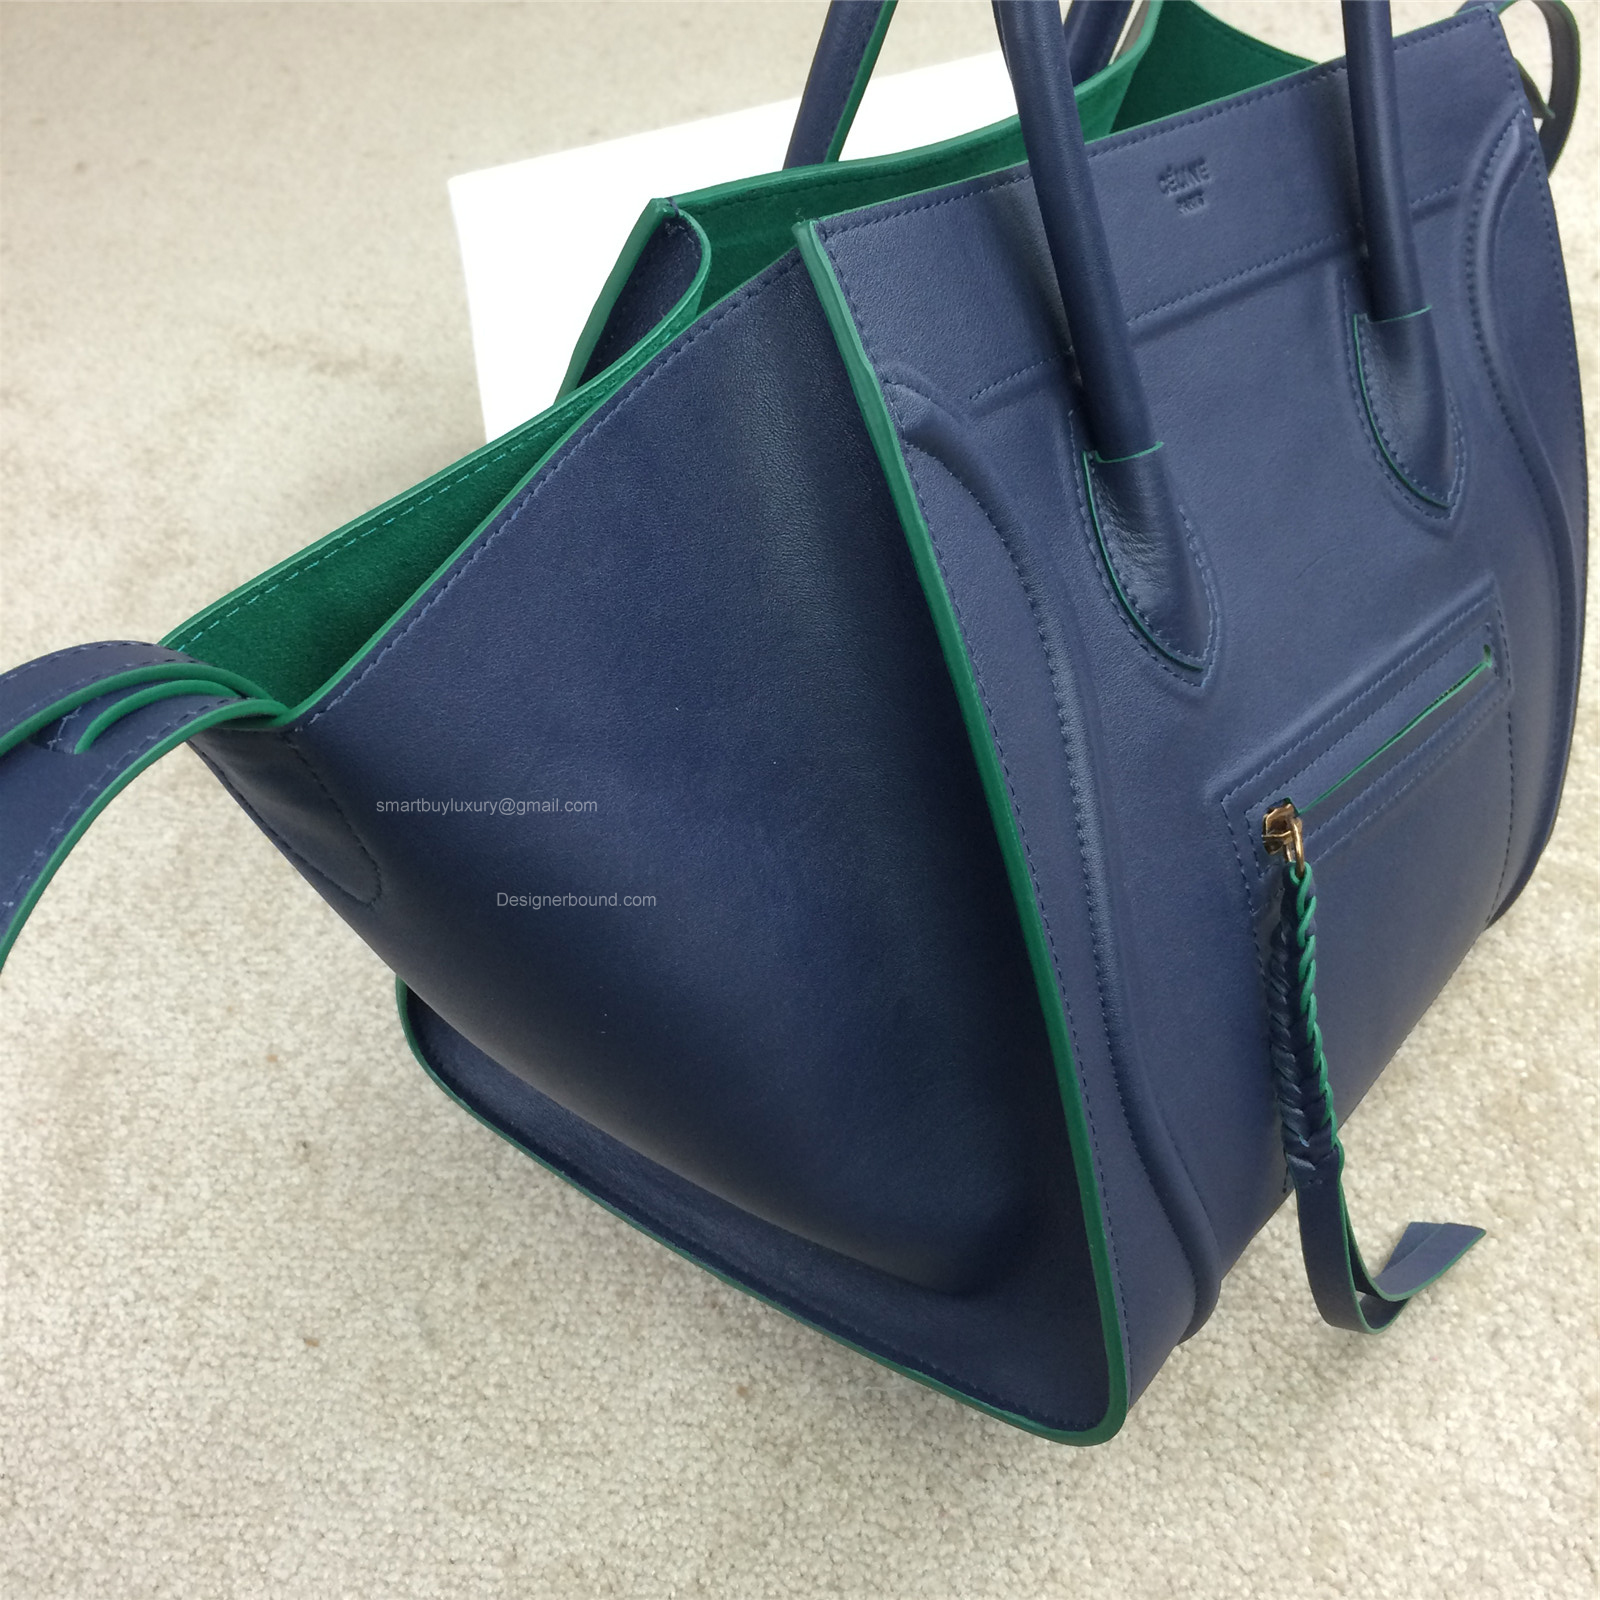 celine phantom luggage navy leather handbag